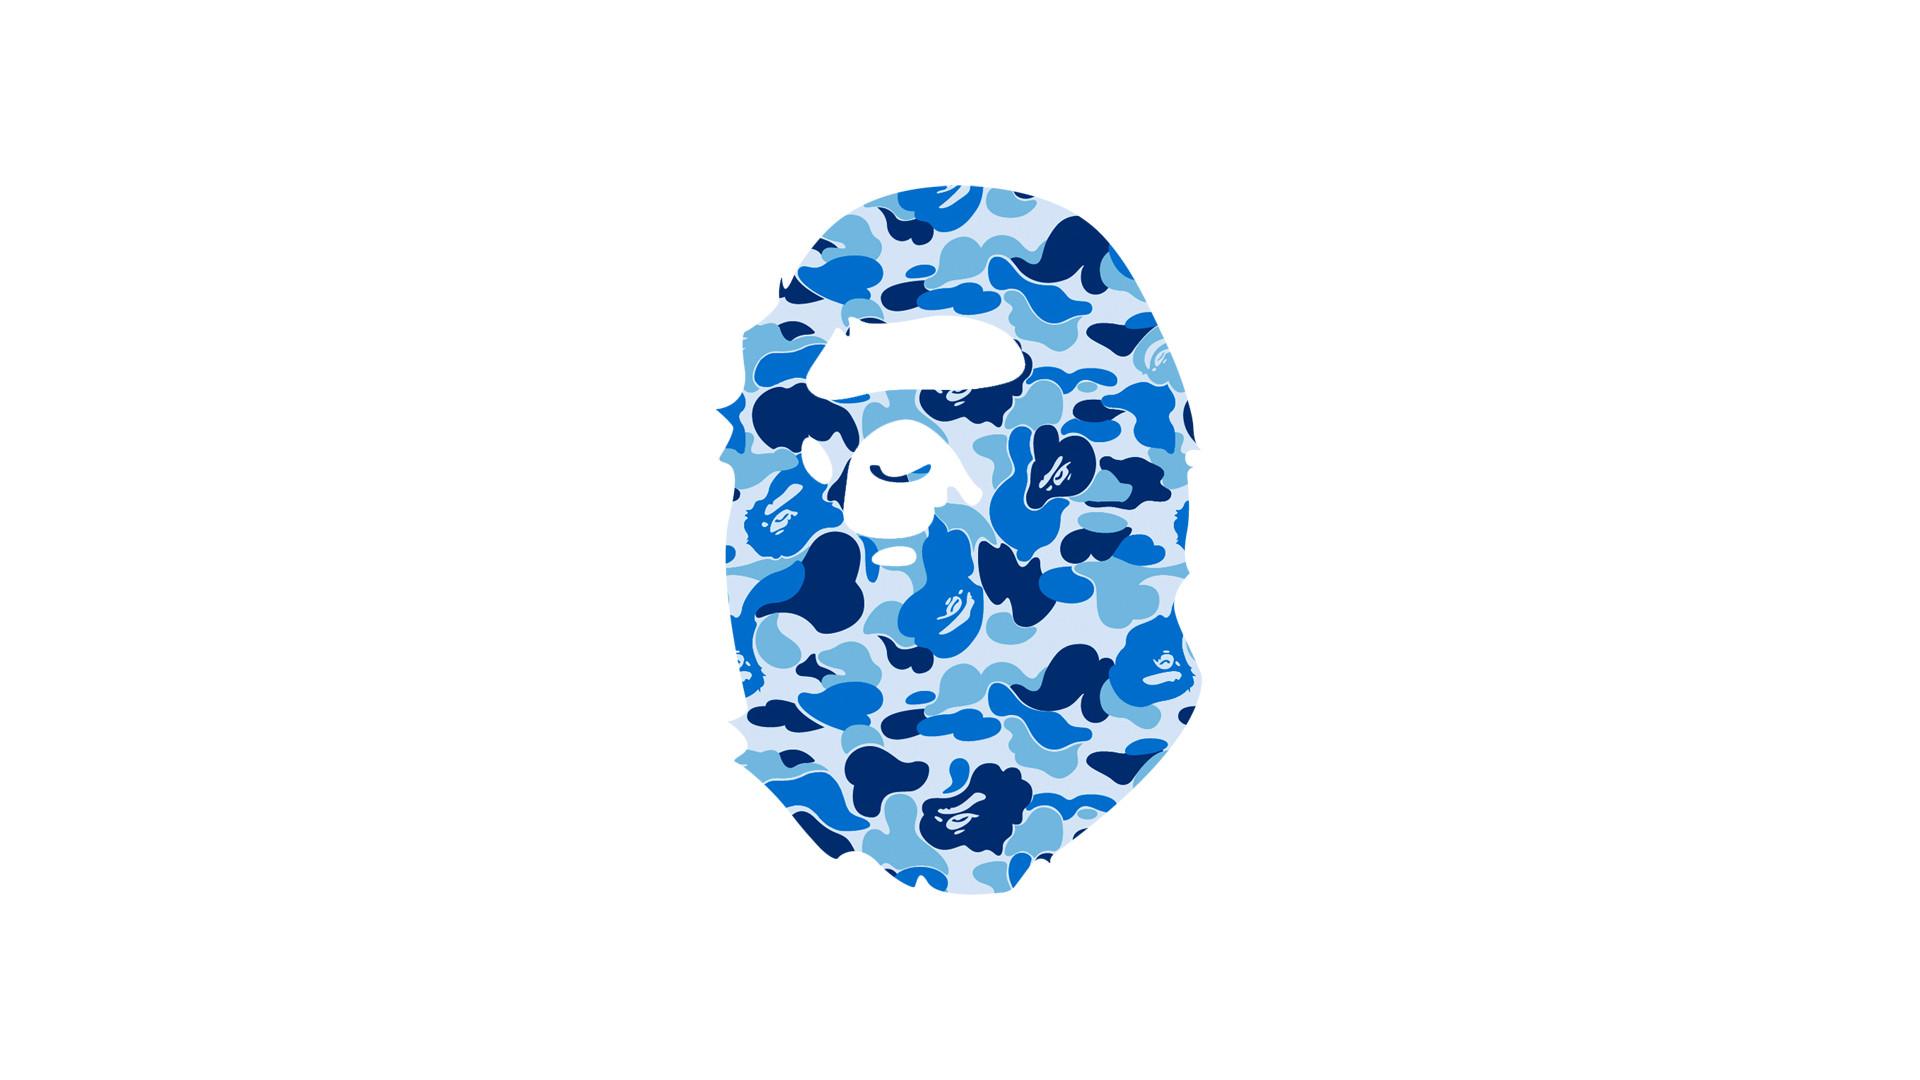 3/3 Bape Blue Camo Ape Head Wallpaper